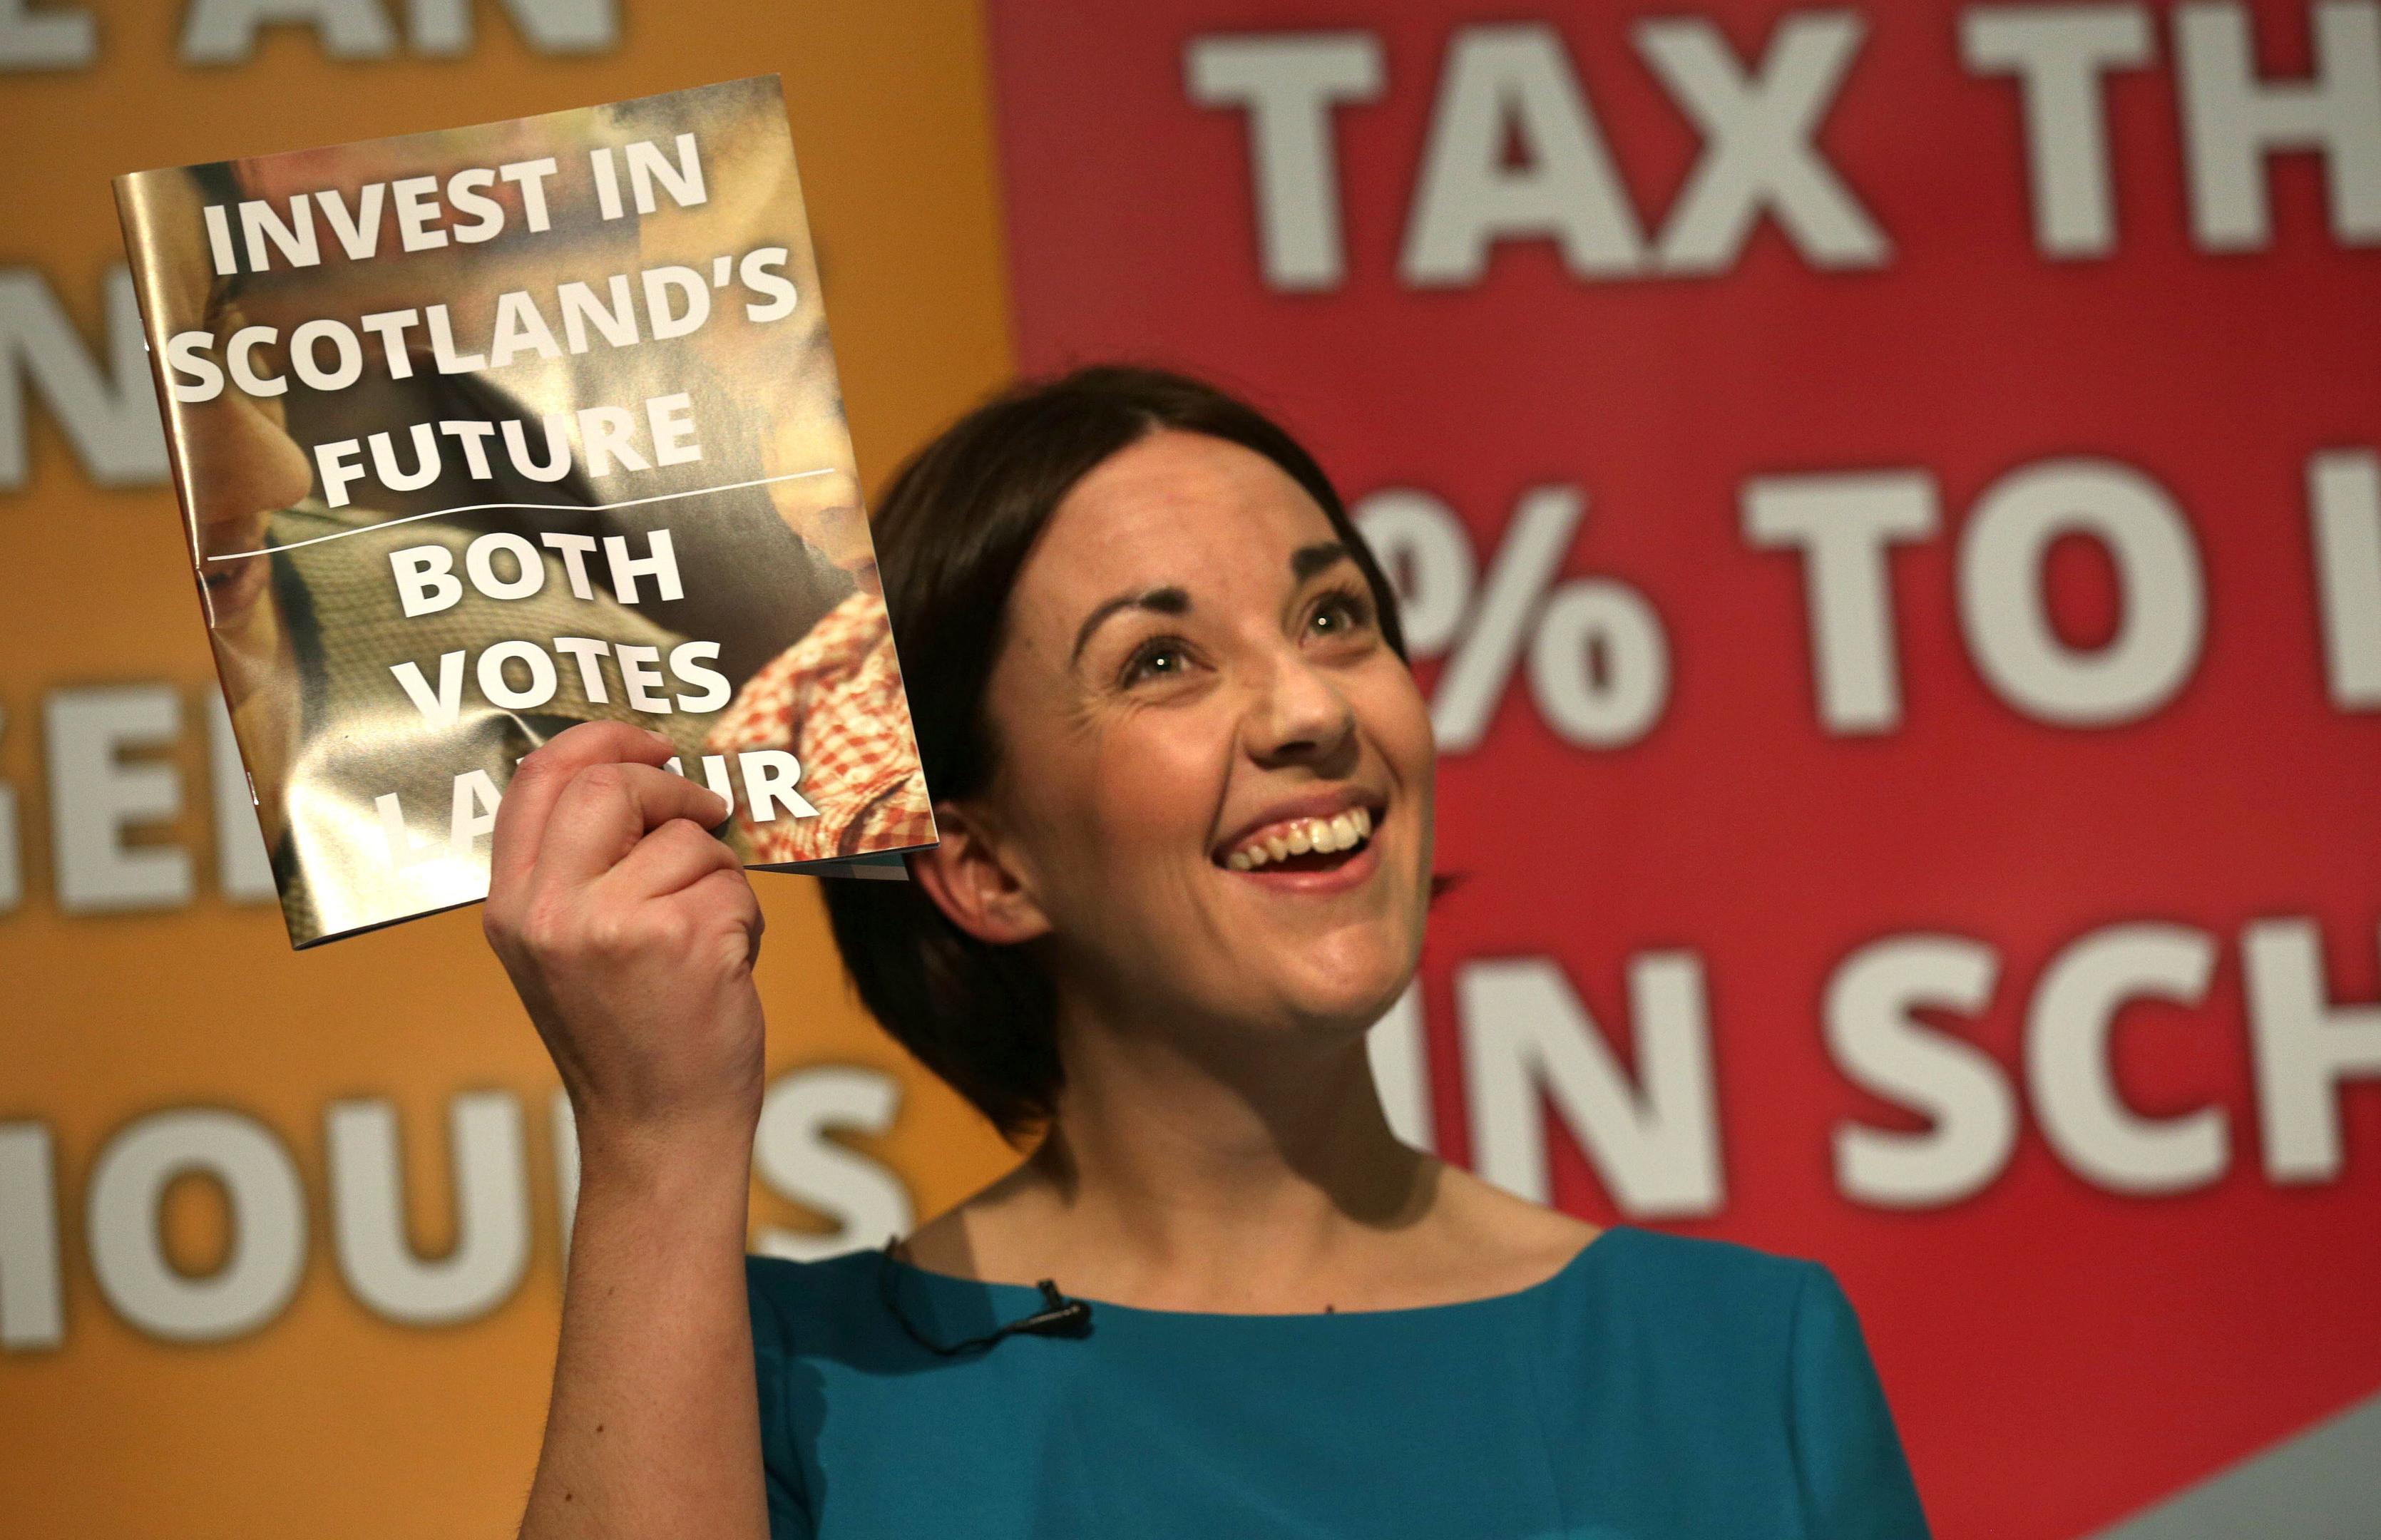 Scottish Labour leader Kezia Dugdale launches her party's manifesto at the Grassmarket Community Project in Edinburgh.